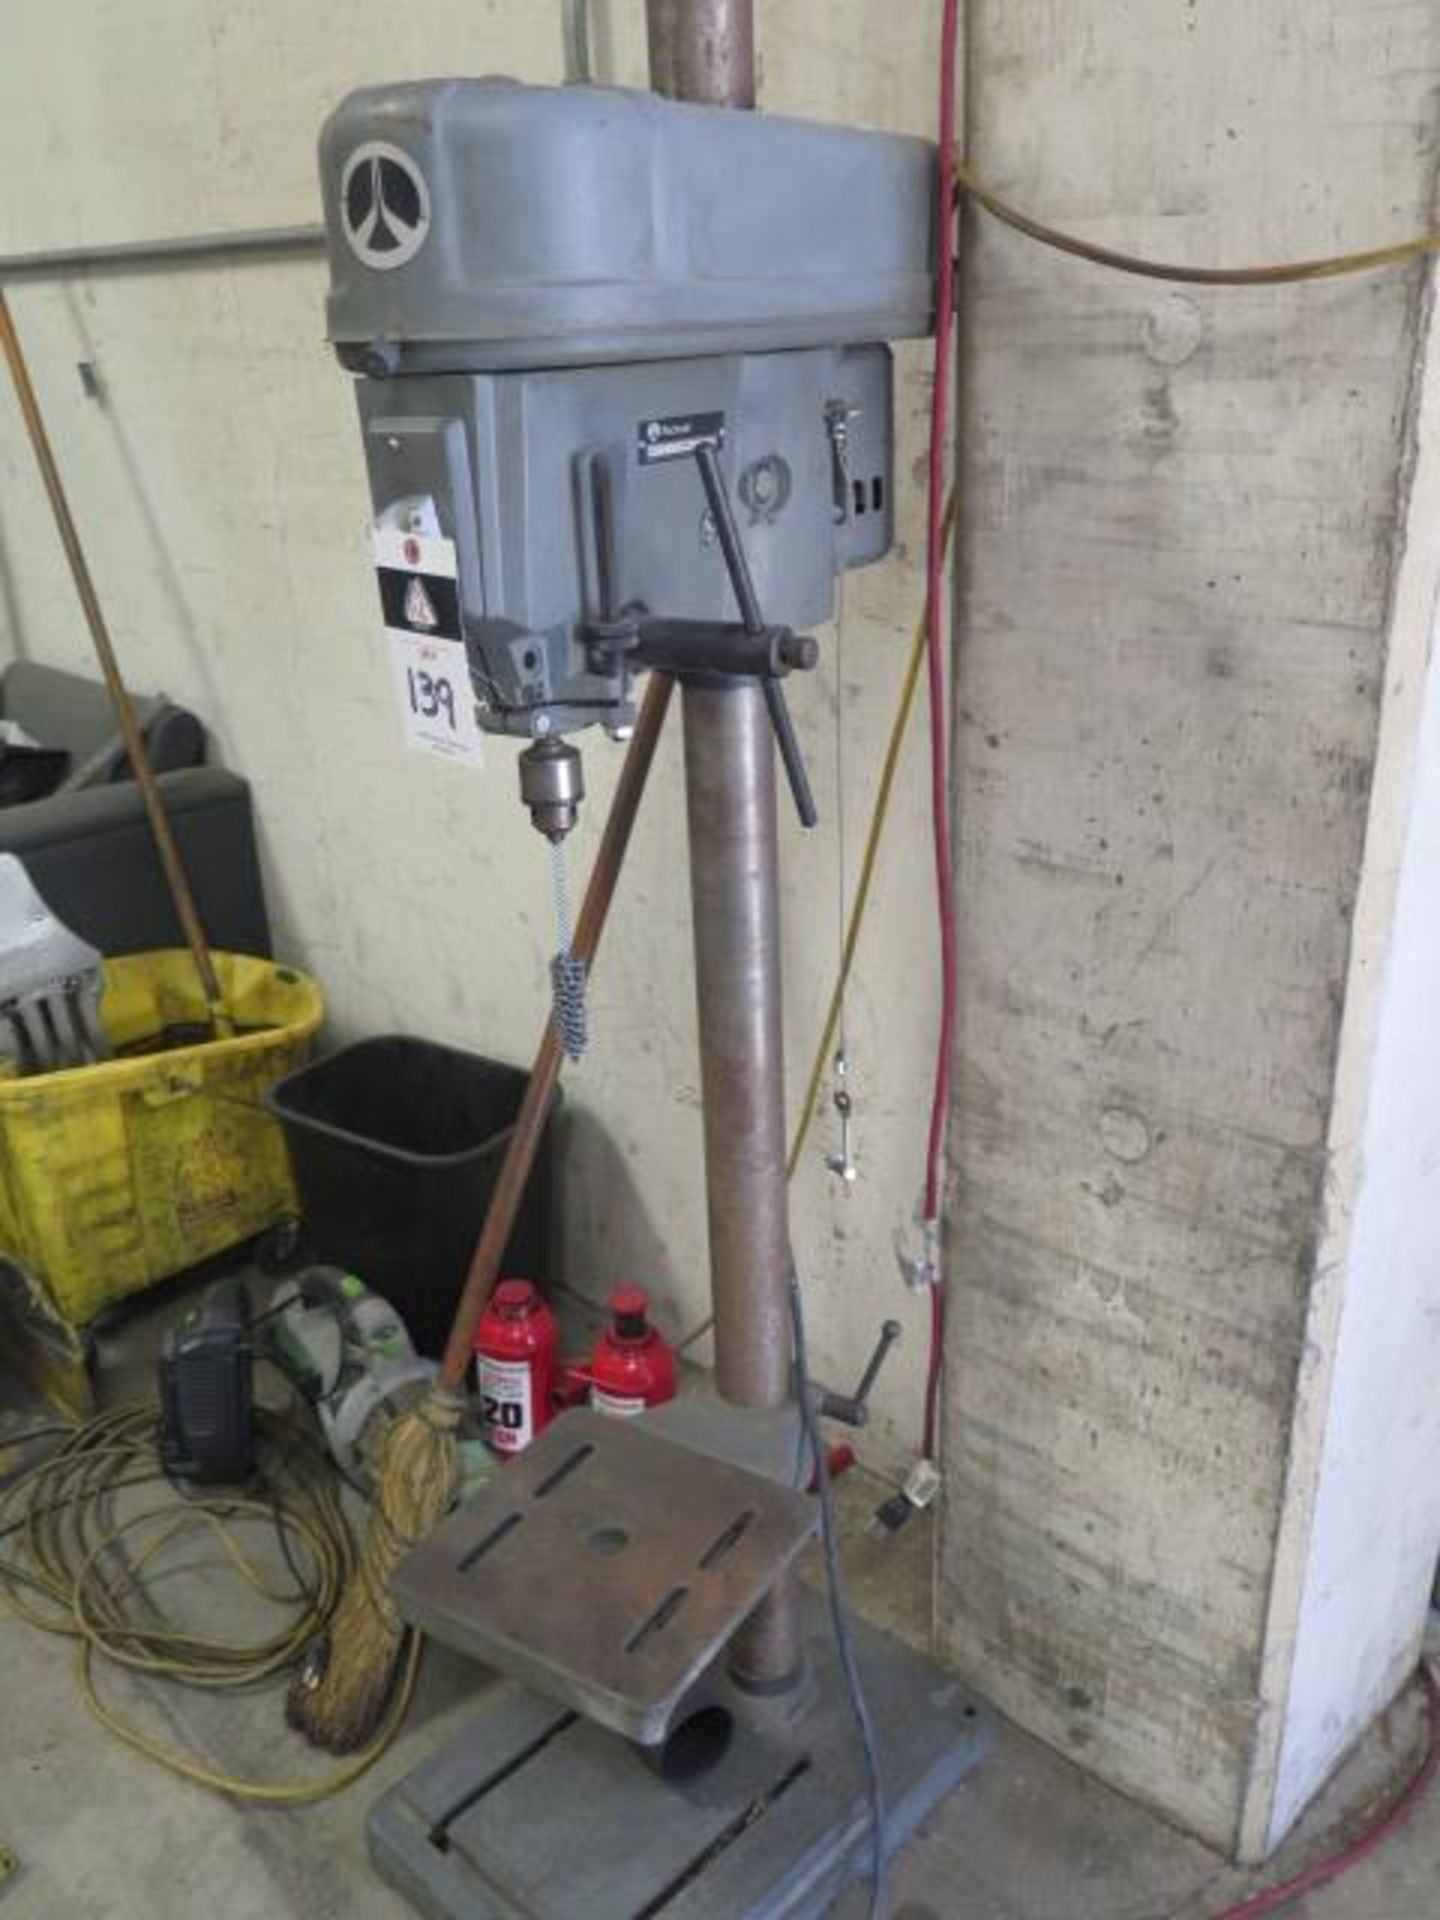 Rockwell Pedestal Drill Press (SOLD AS-IS - NO WARRANTY)